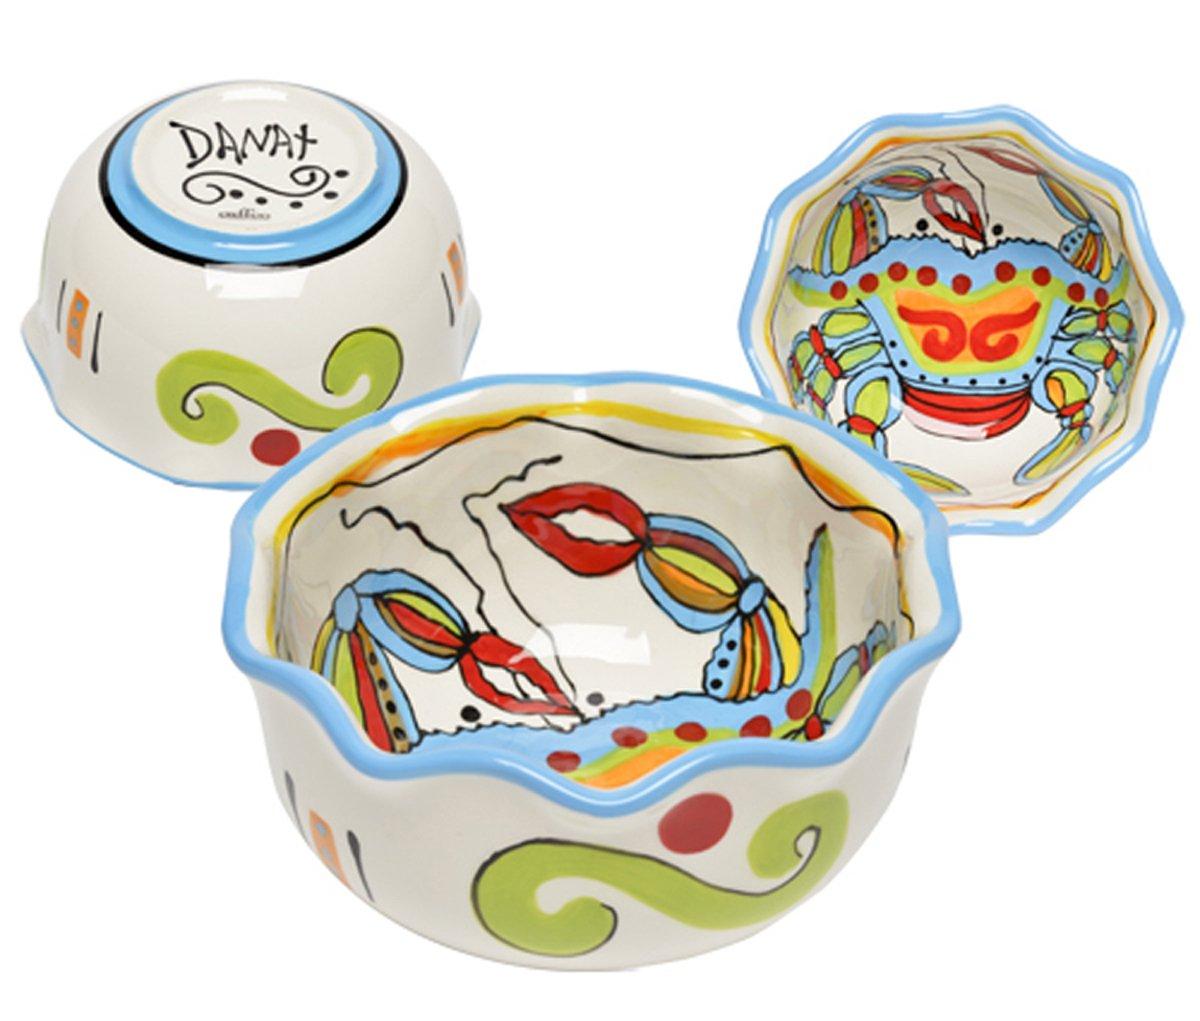 Buy Dana Wittmann Ceramic Now!